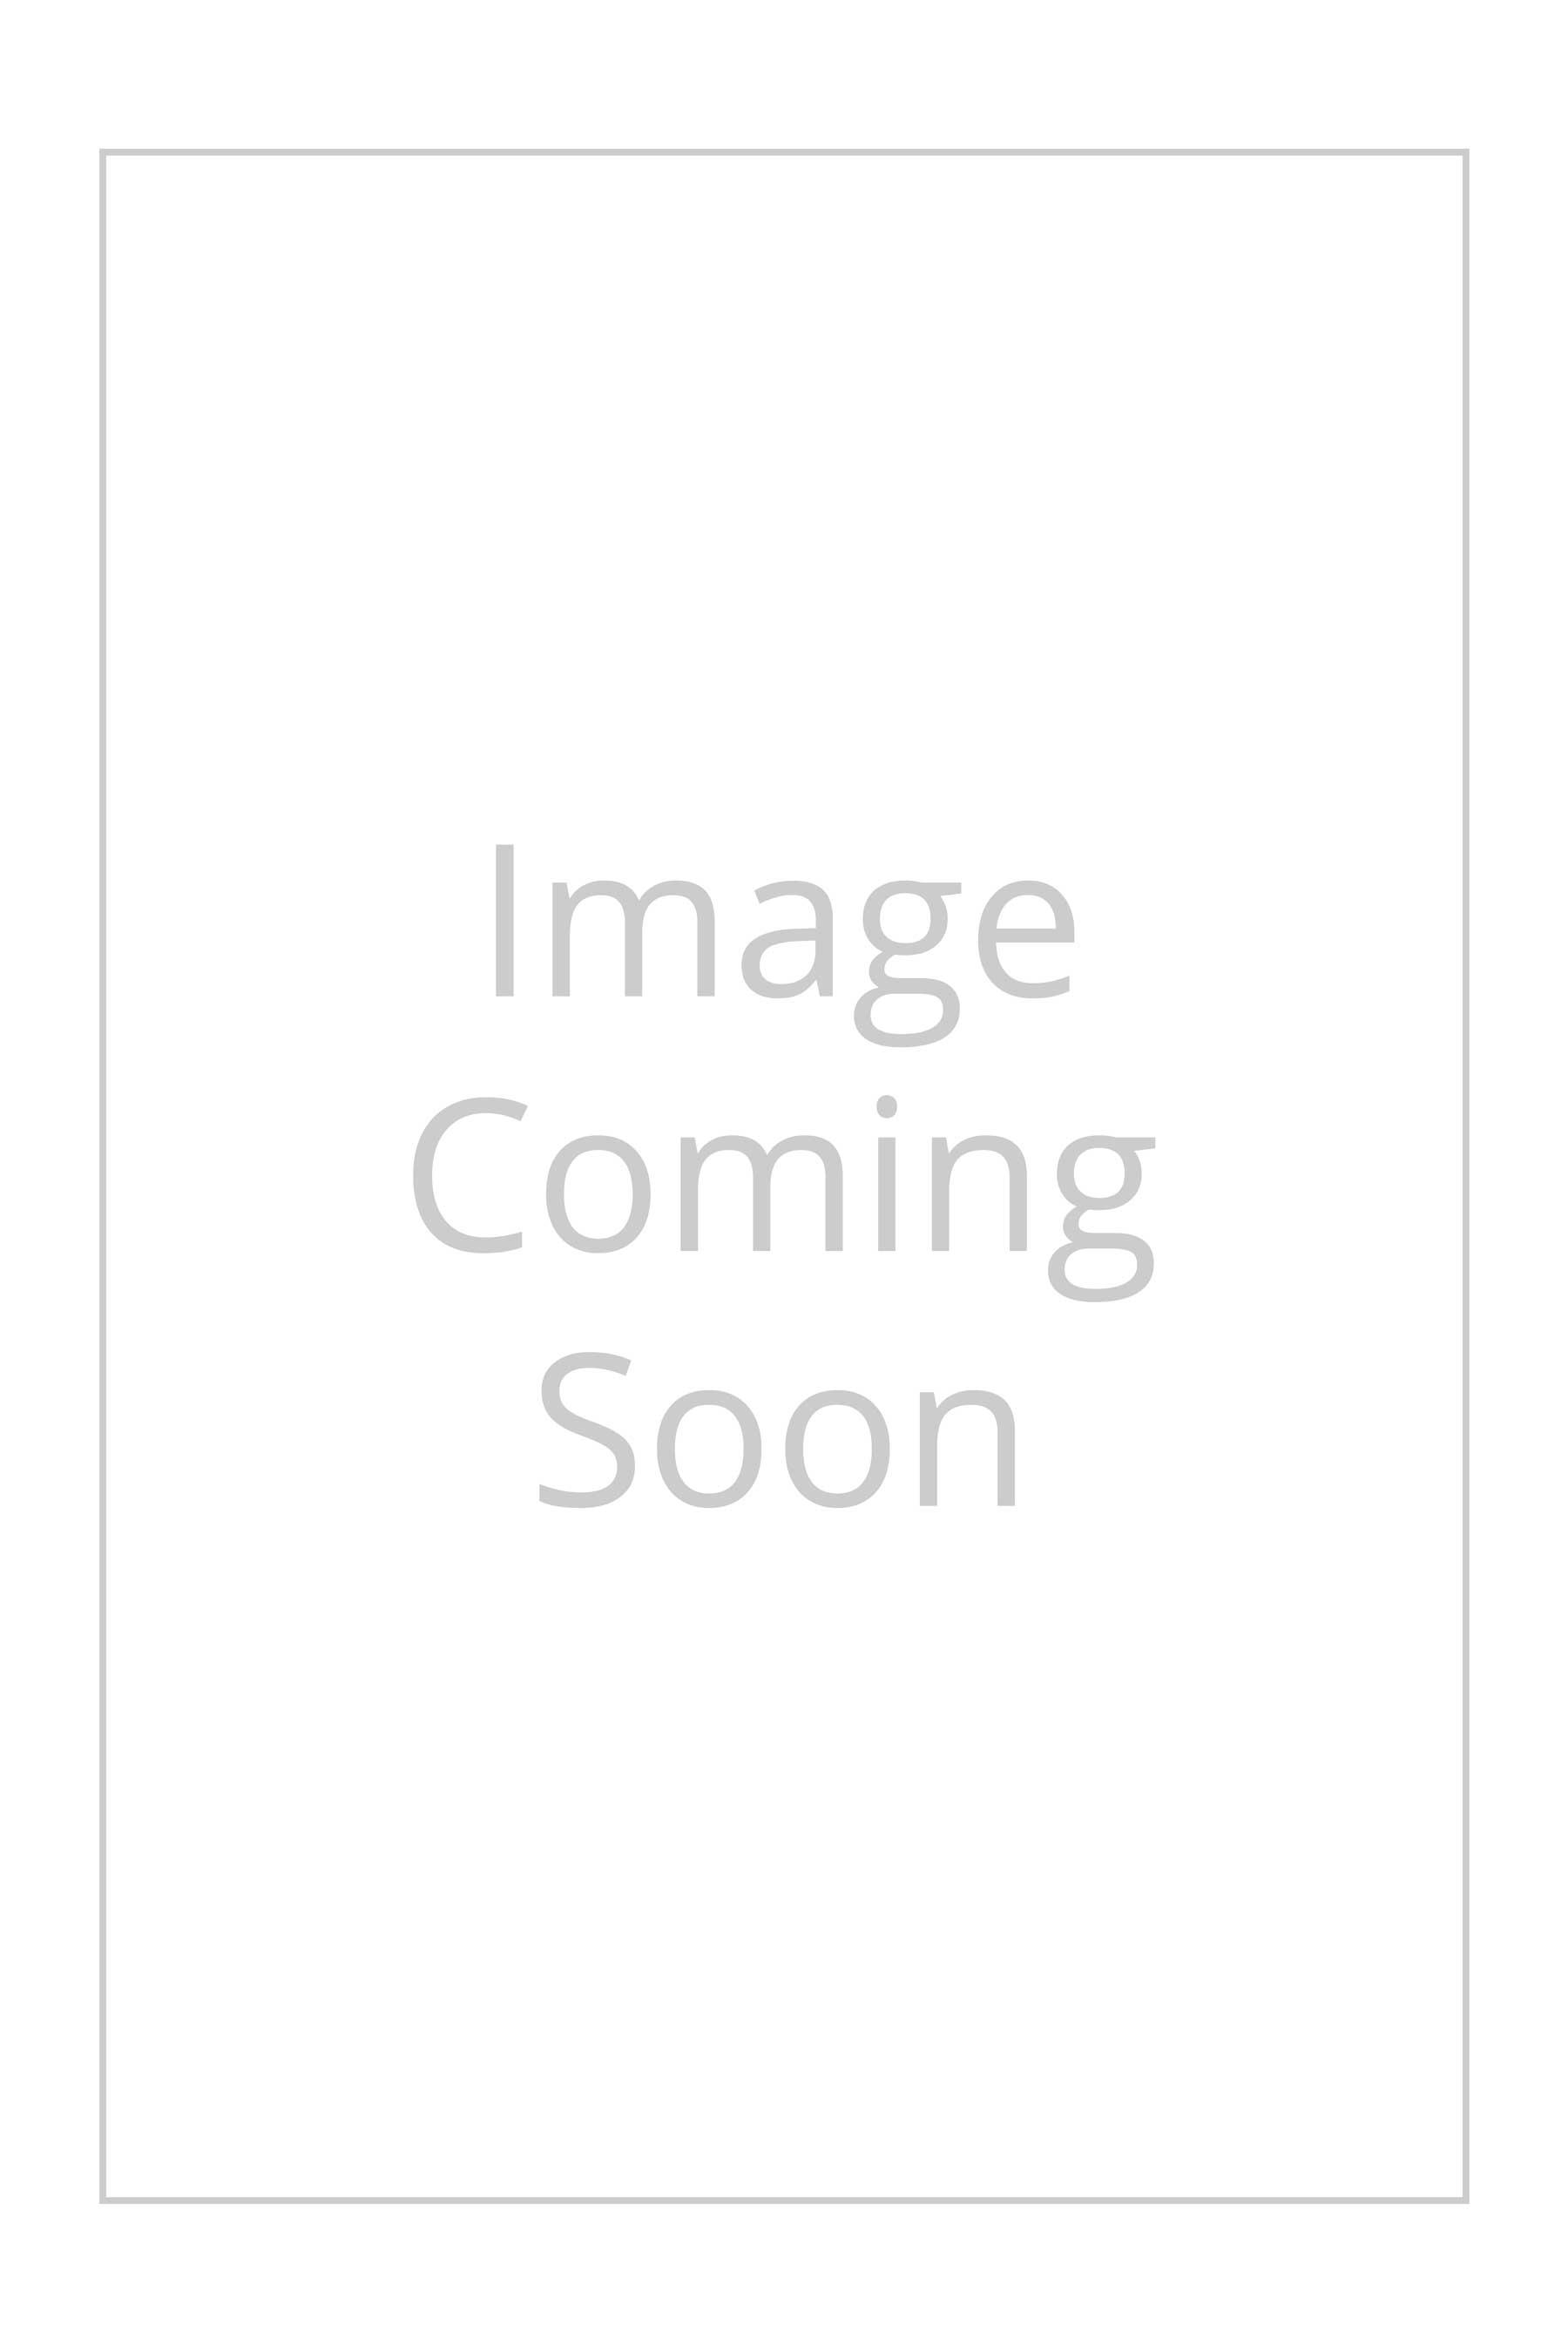 St. John Gradient Boucle Knit Sleeveless Sheath Dress in Black & White